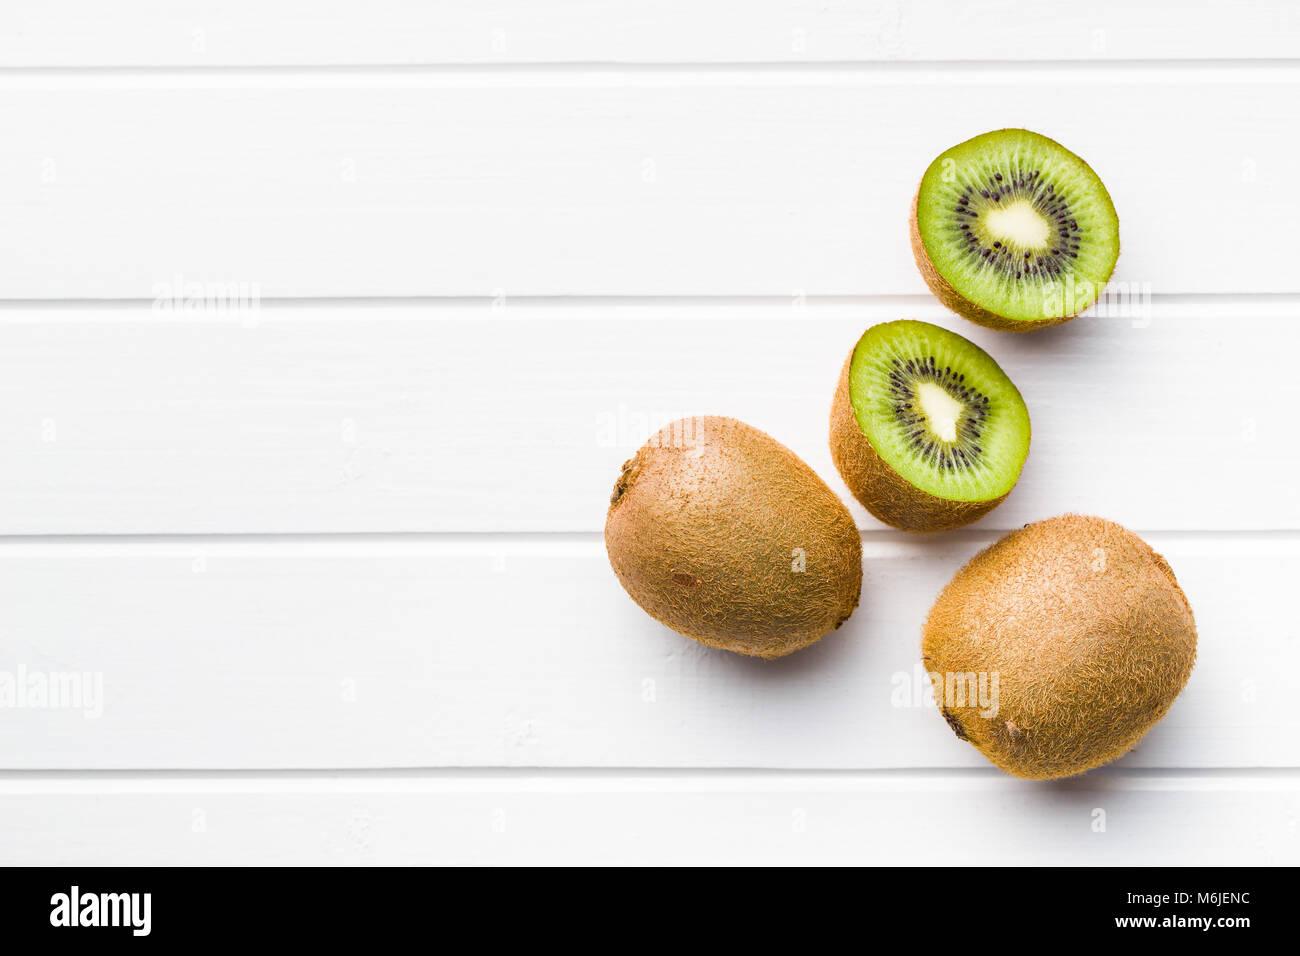 Halved kiwi fruit on white table. - Stock Image